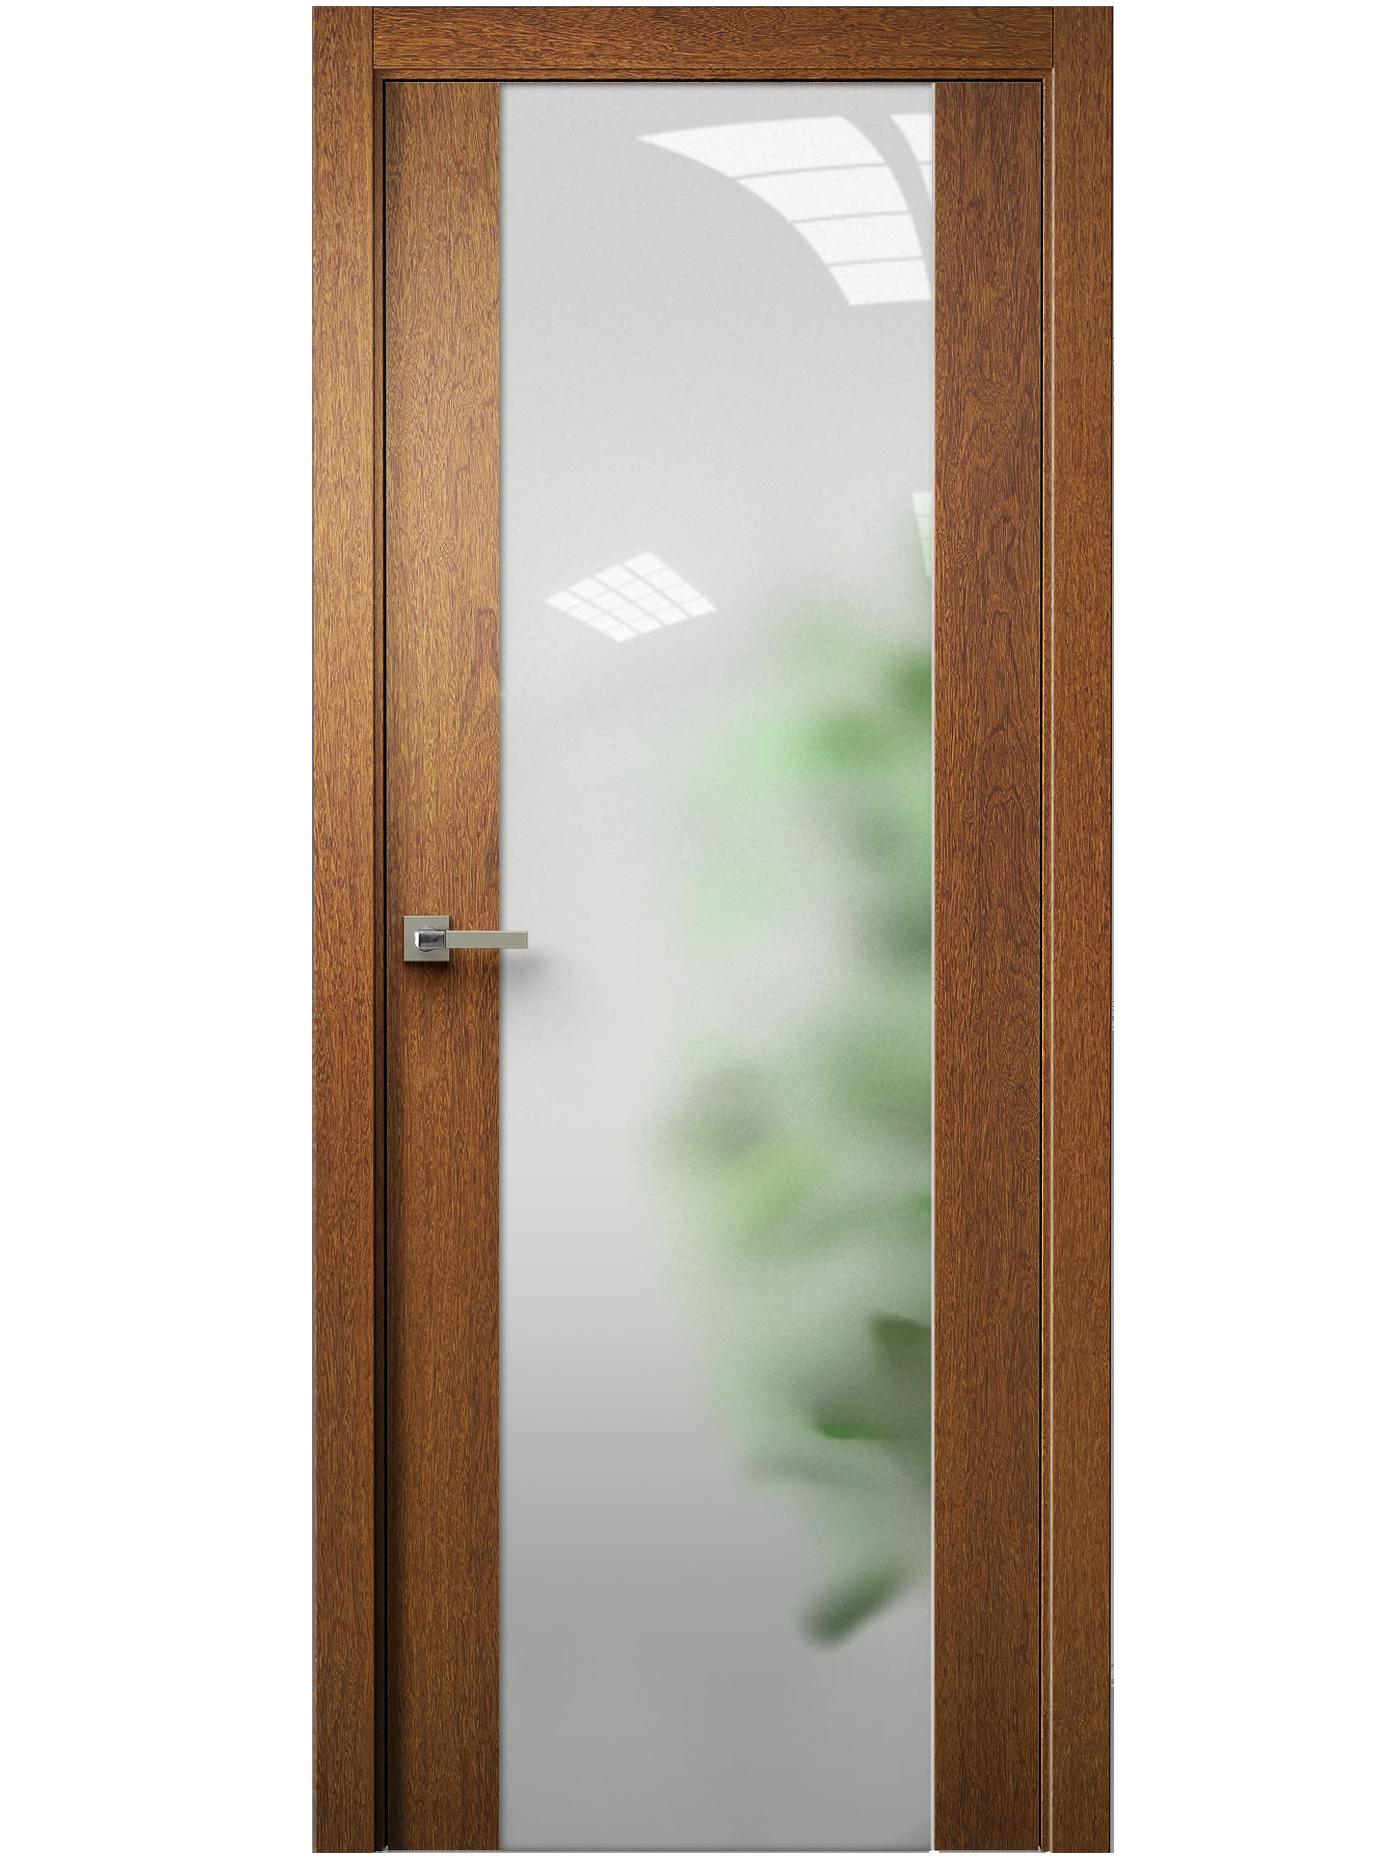 Image Vetra Interior Door Sucupira / Frosted Glass 0